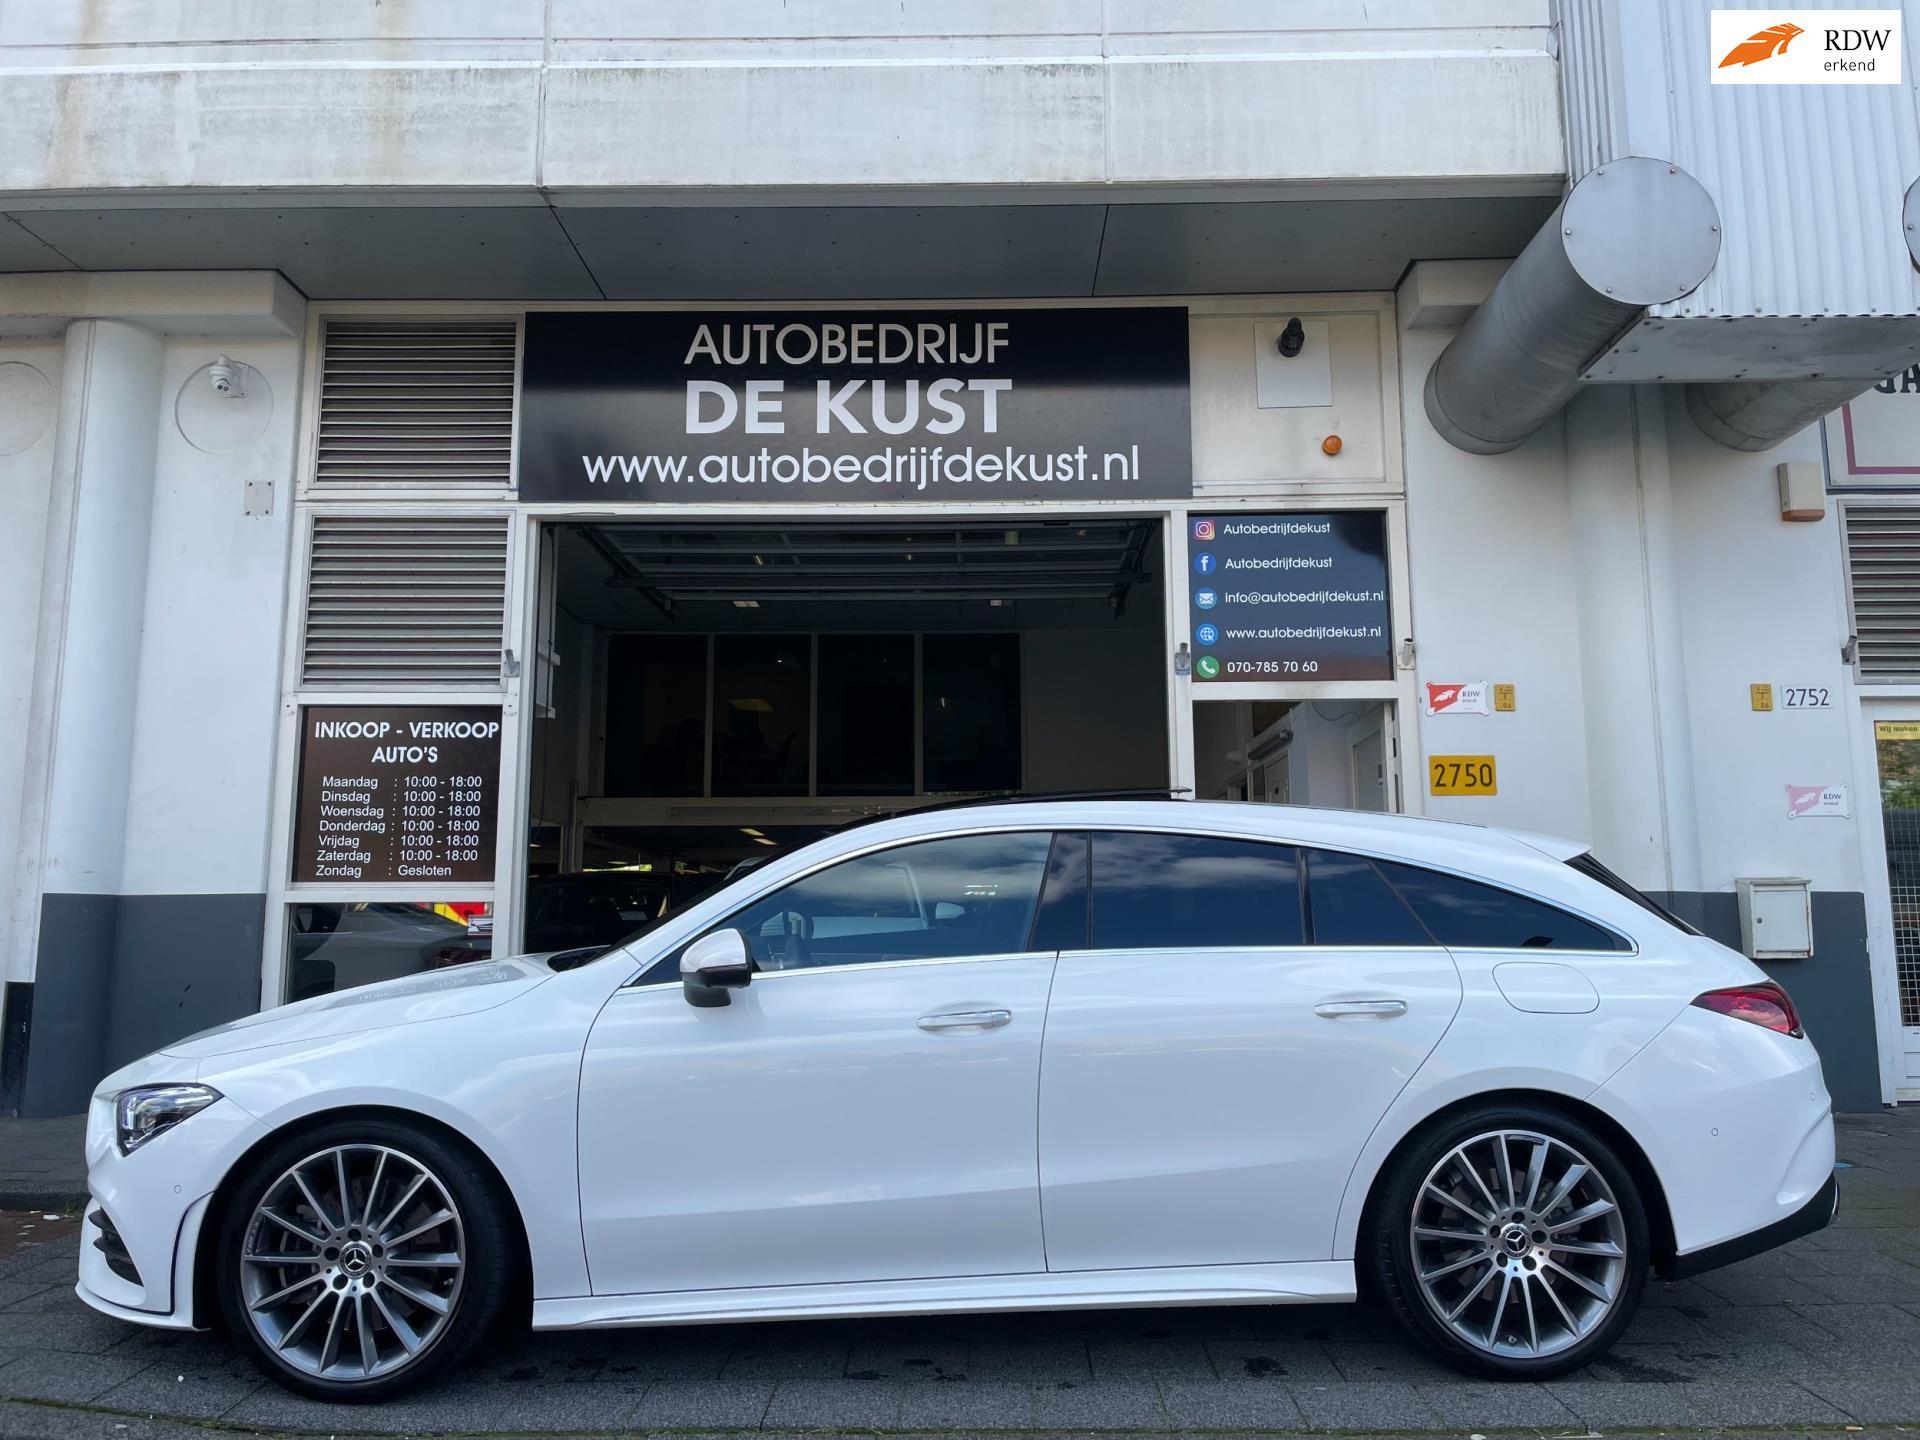 Mercedes-Benz CLA-klasse SB occasion - Autobedrijf De Kust B.V.